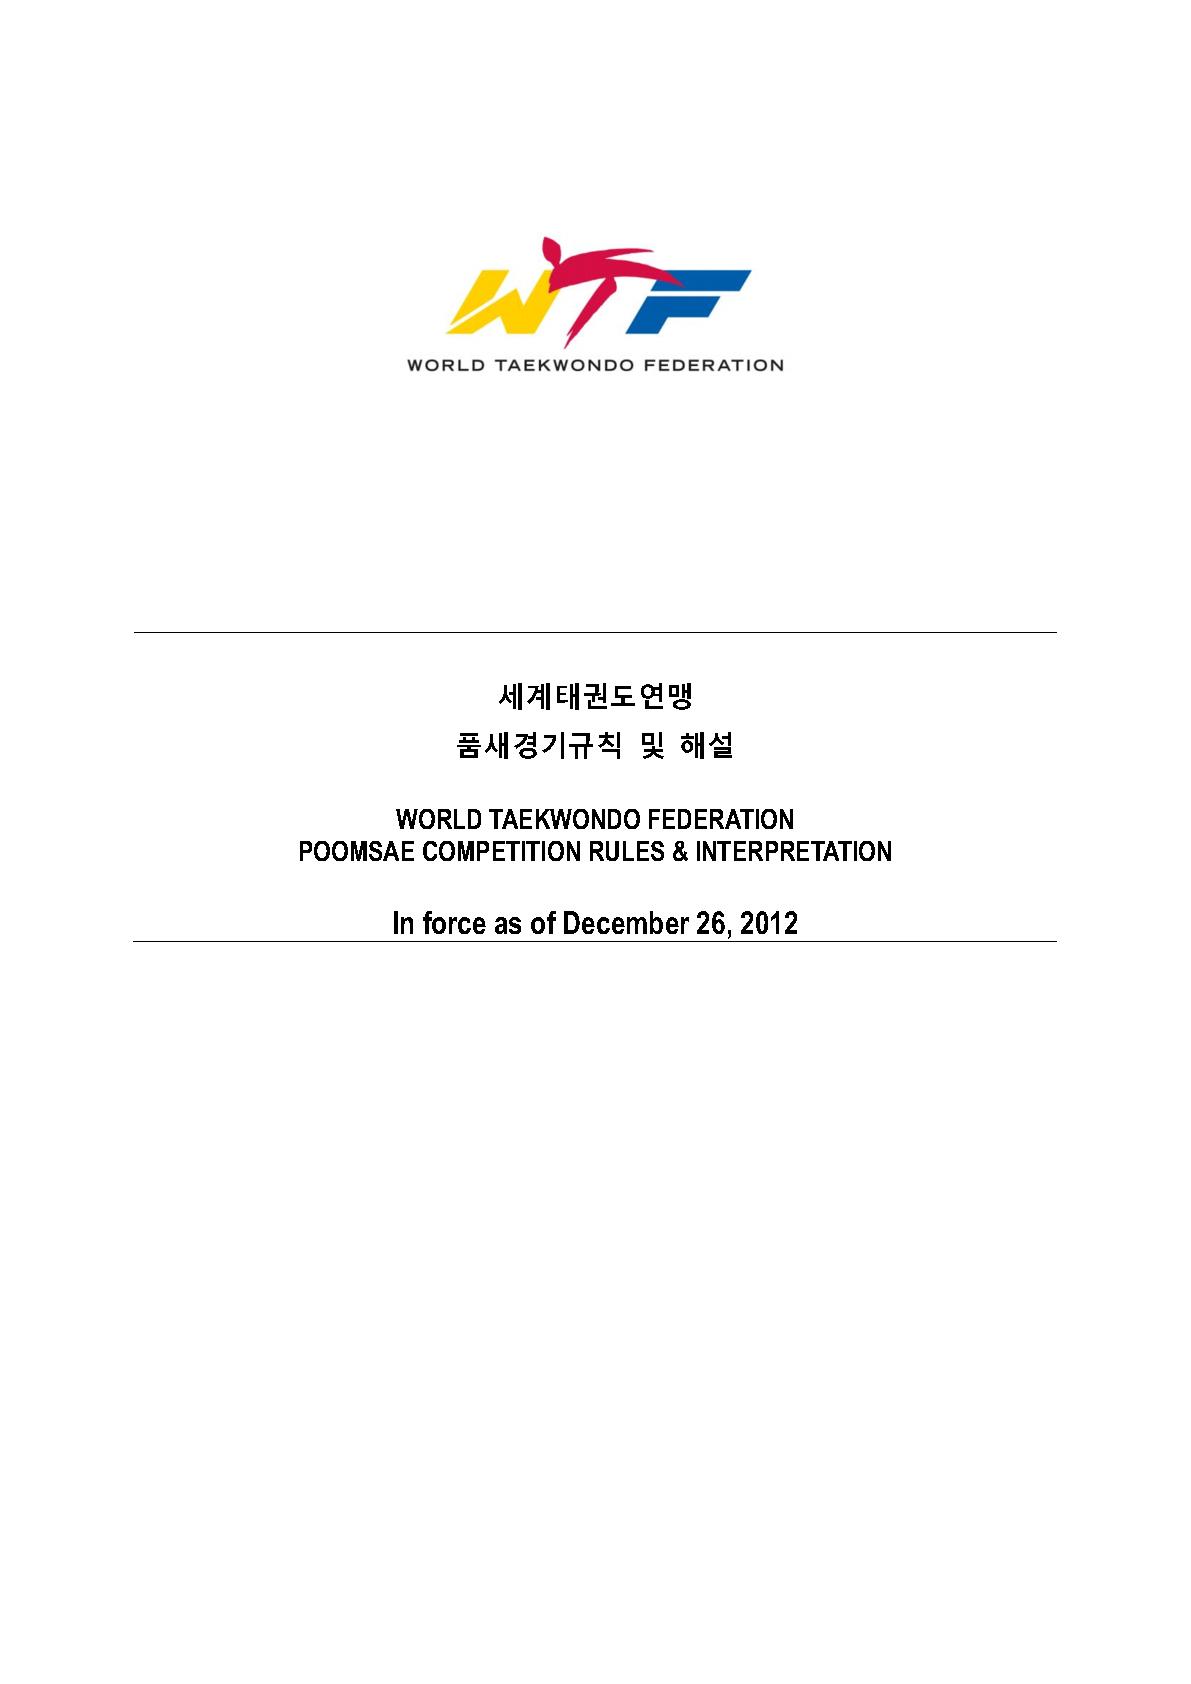 WTF Poomsae Rules - Poomsae_Competition_Rules_and_Interpretation_E-ballot_V3 (1)_1